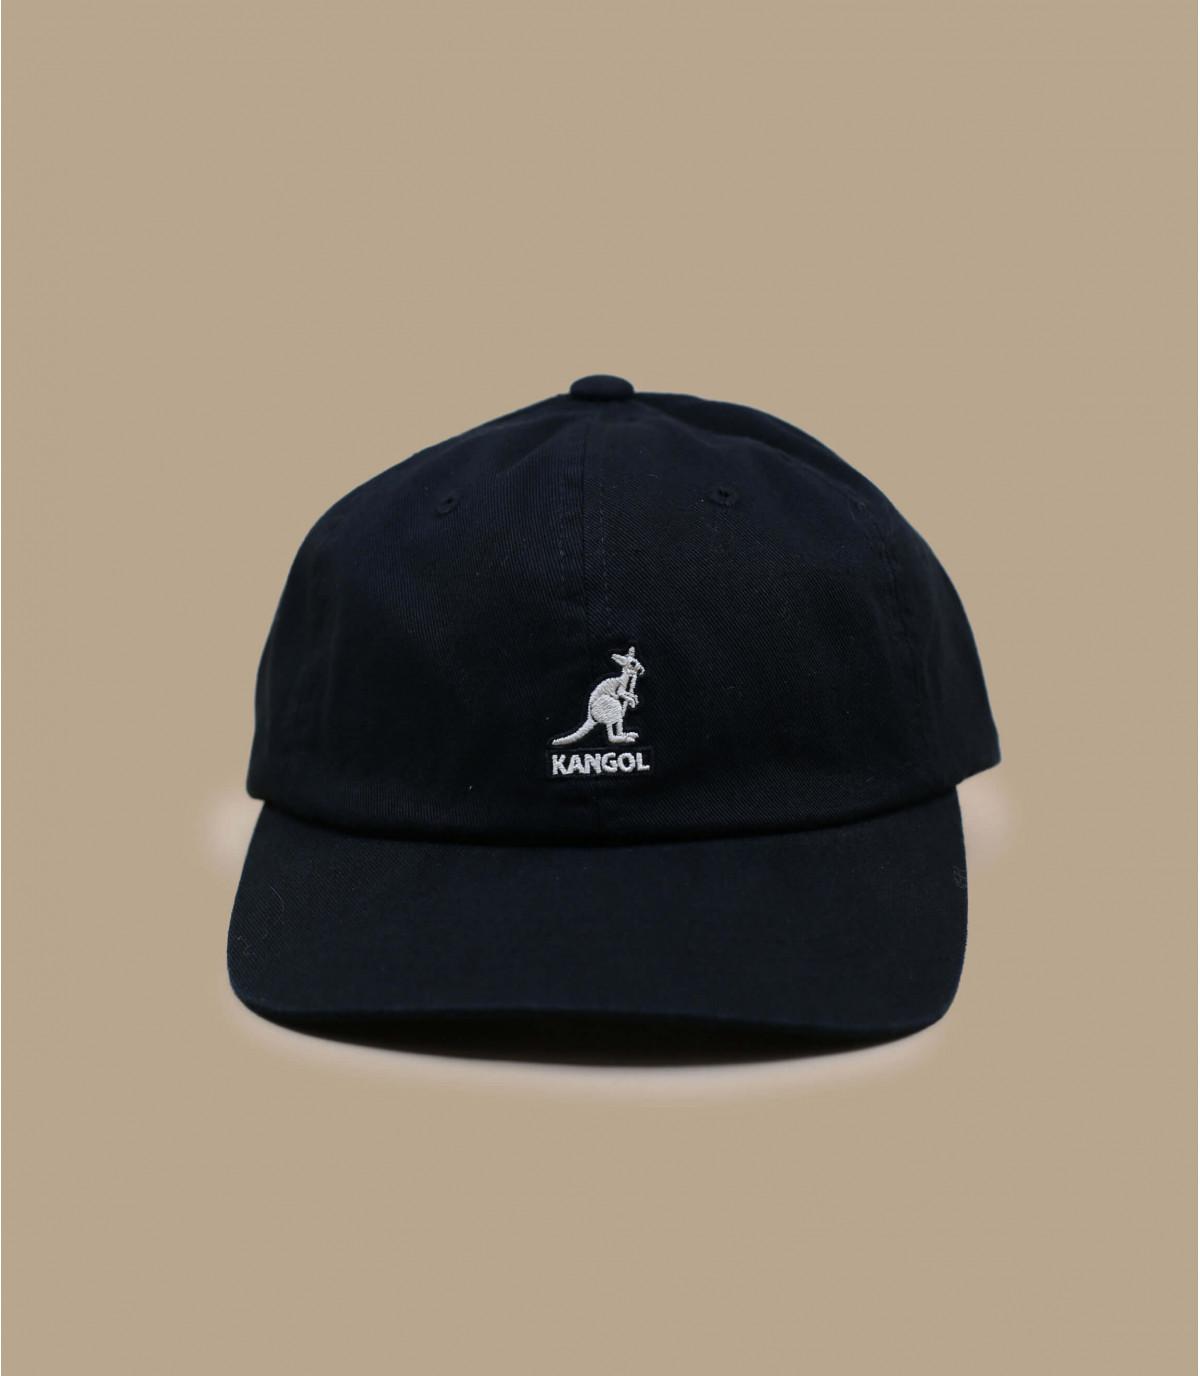 Zwarte katoenen baseball cap Kangol